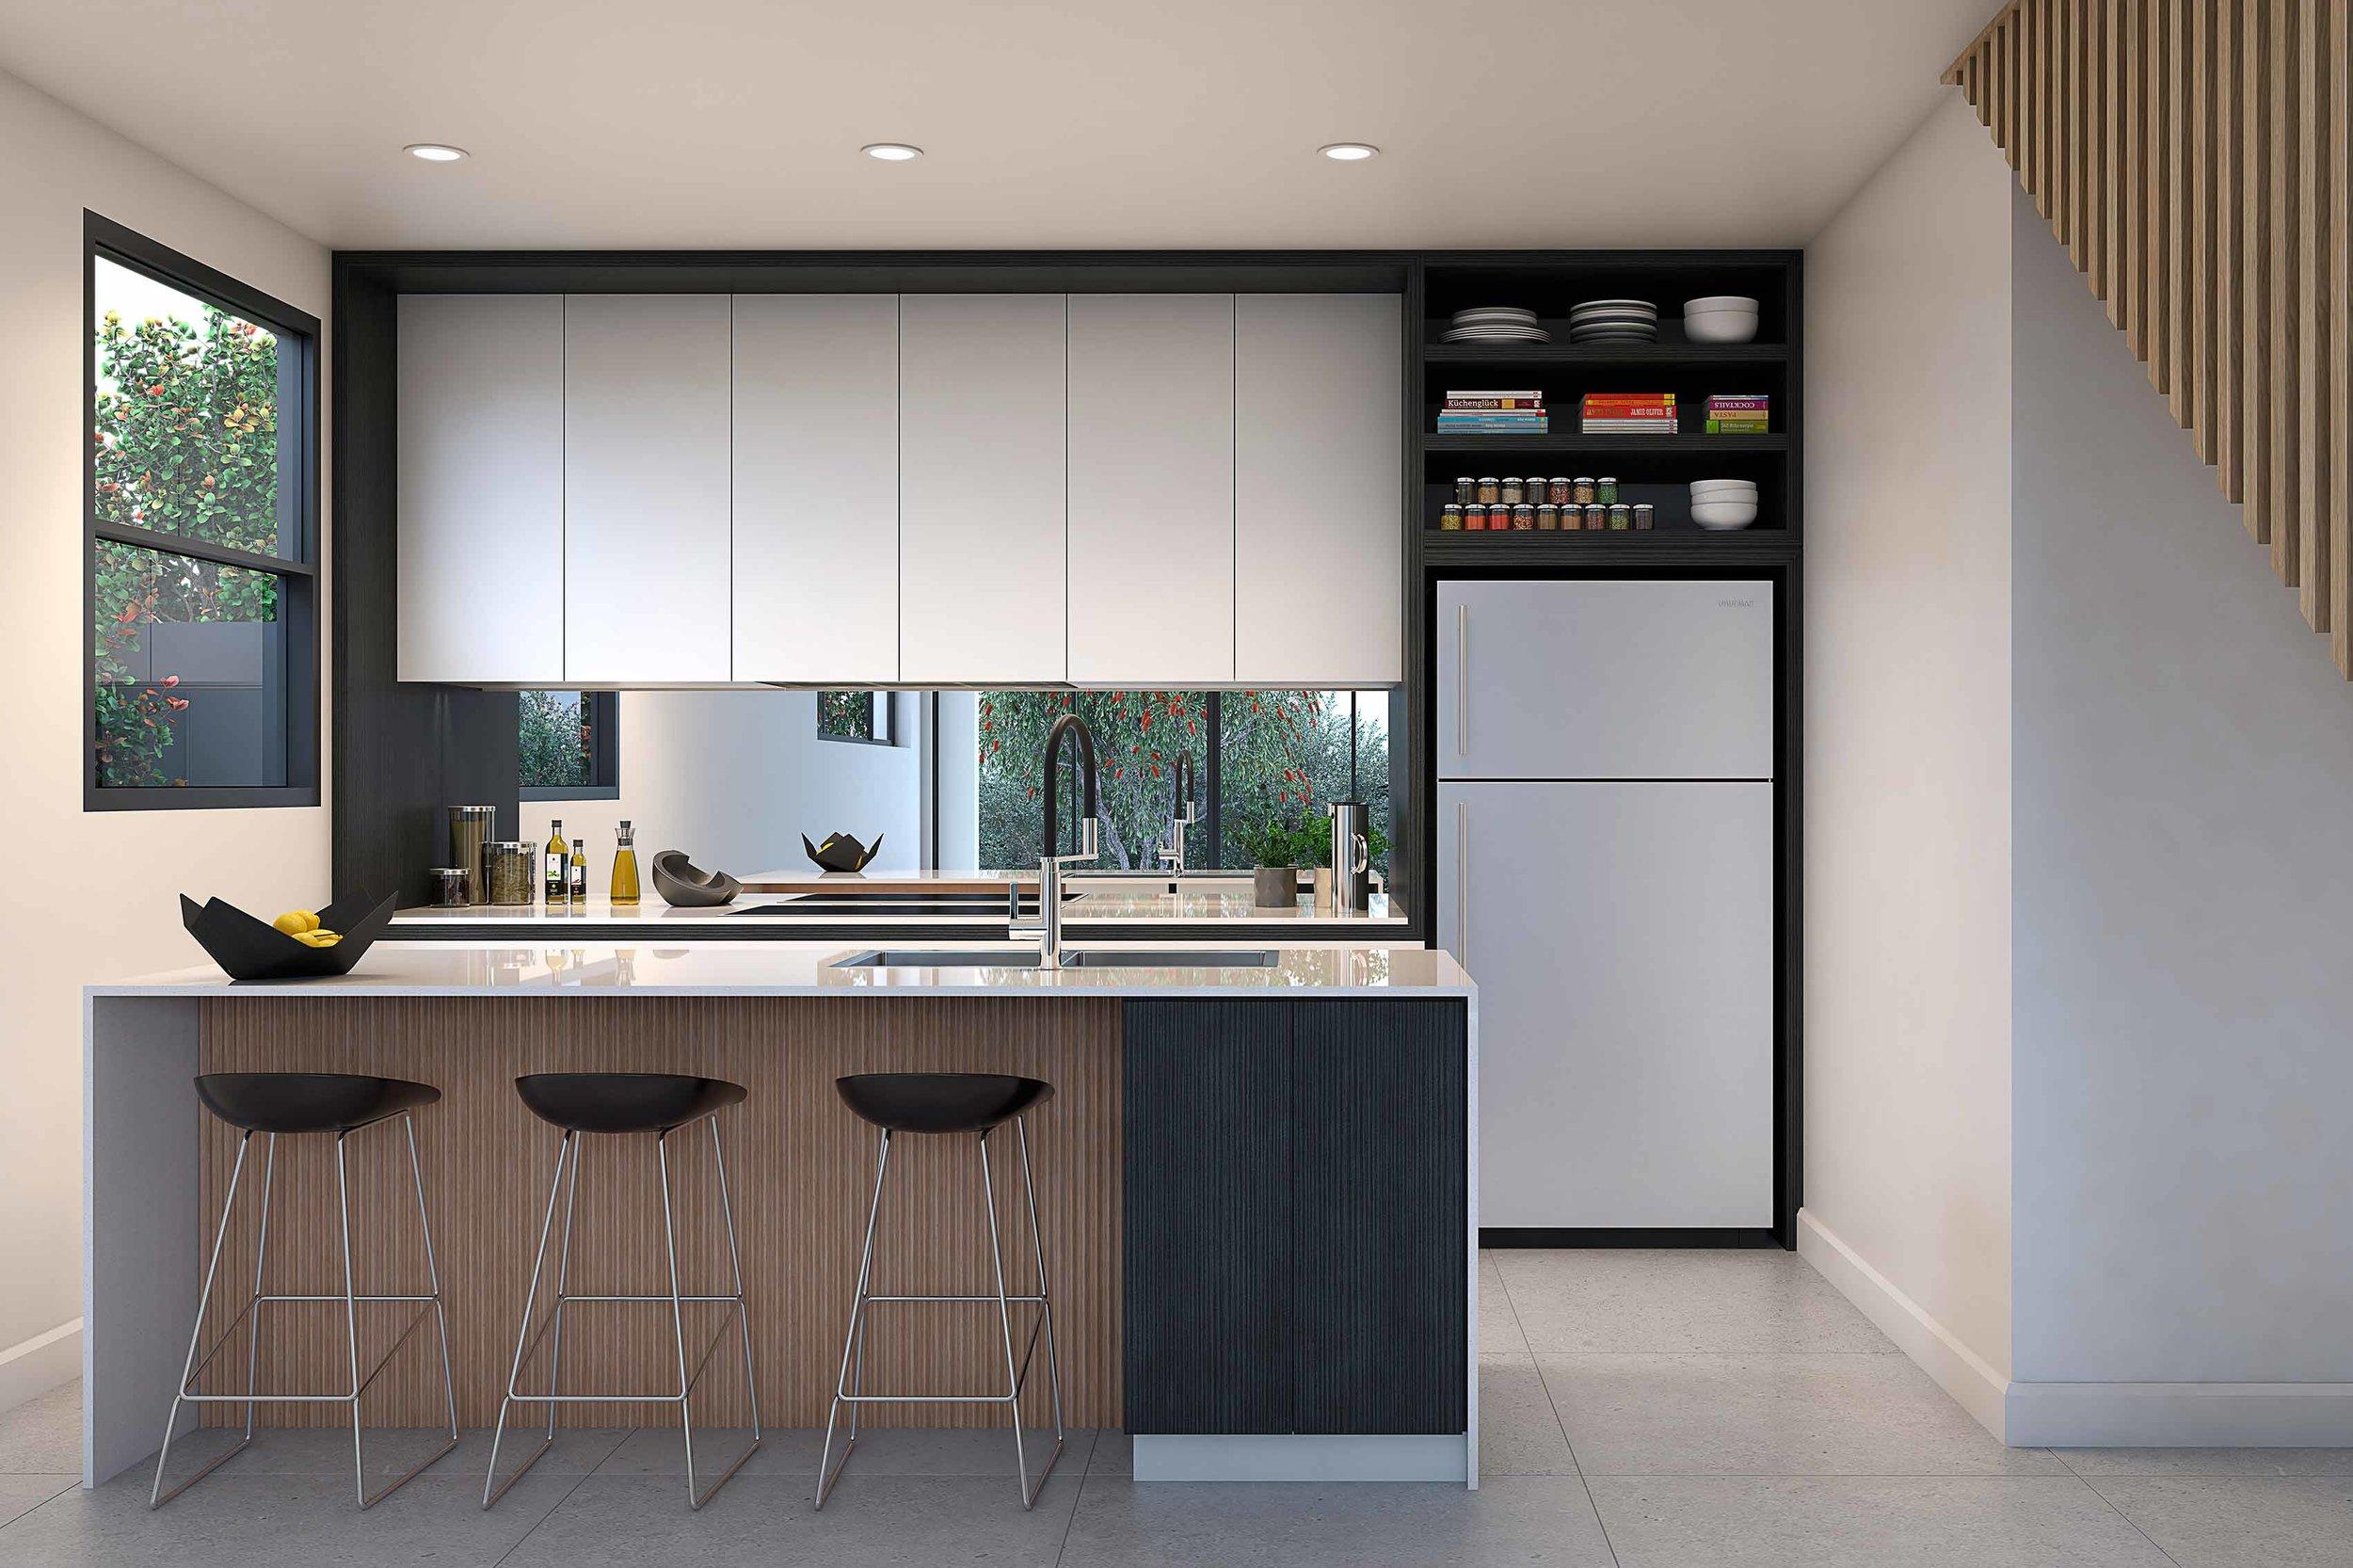 26_Wollun_St_Unit1_Kitchen-HR01-enhanced_WEB.jpg